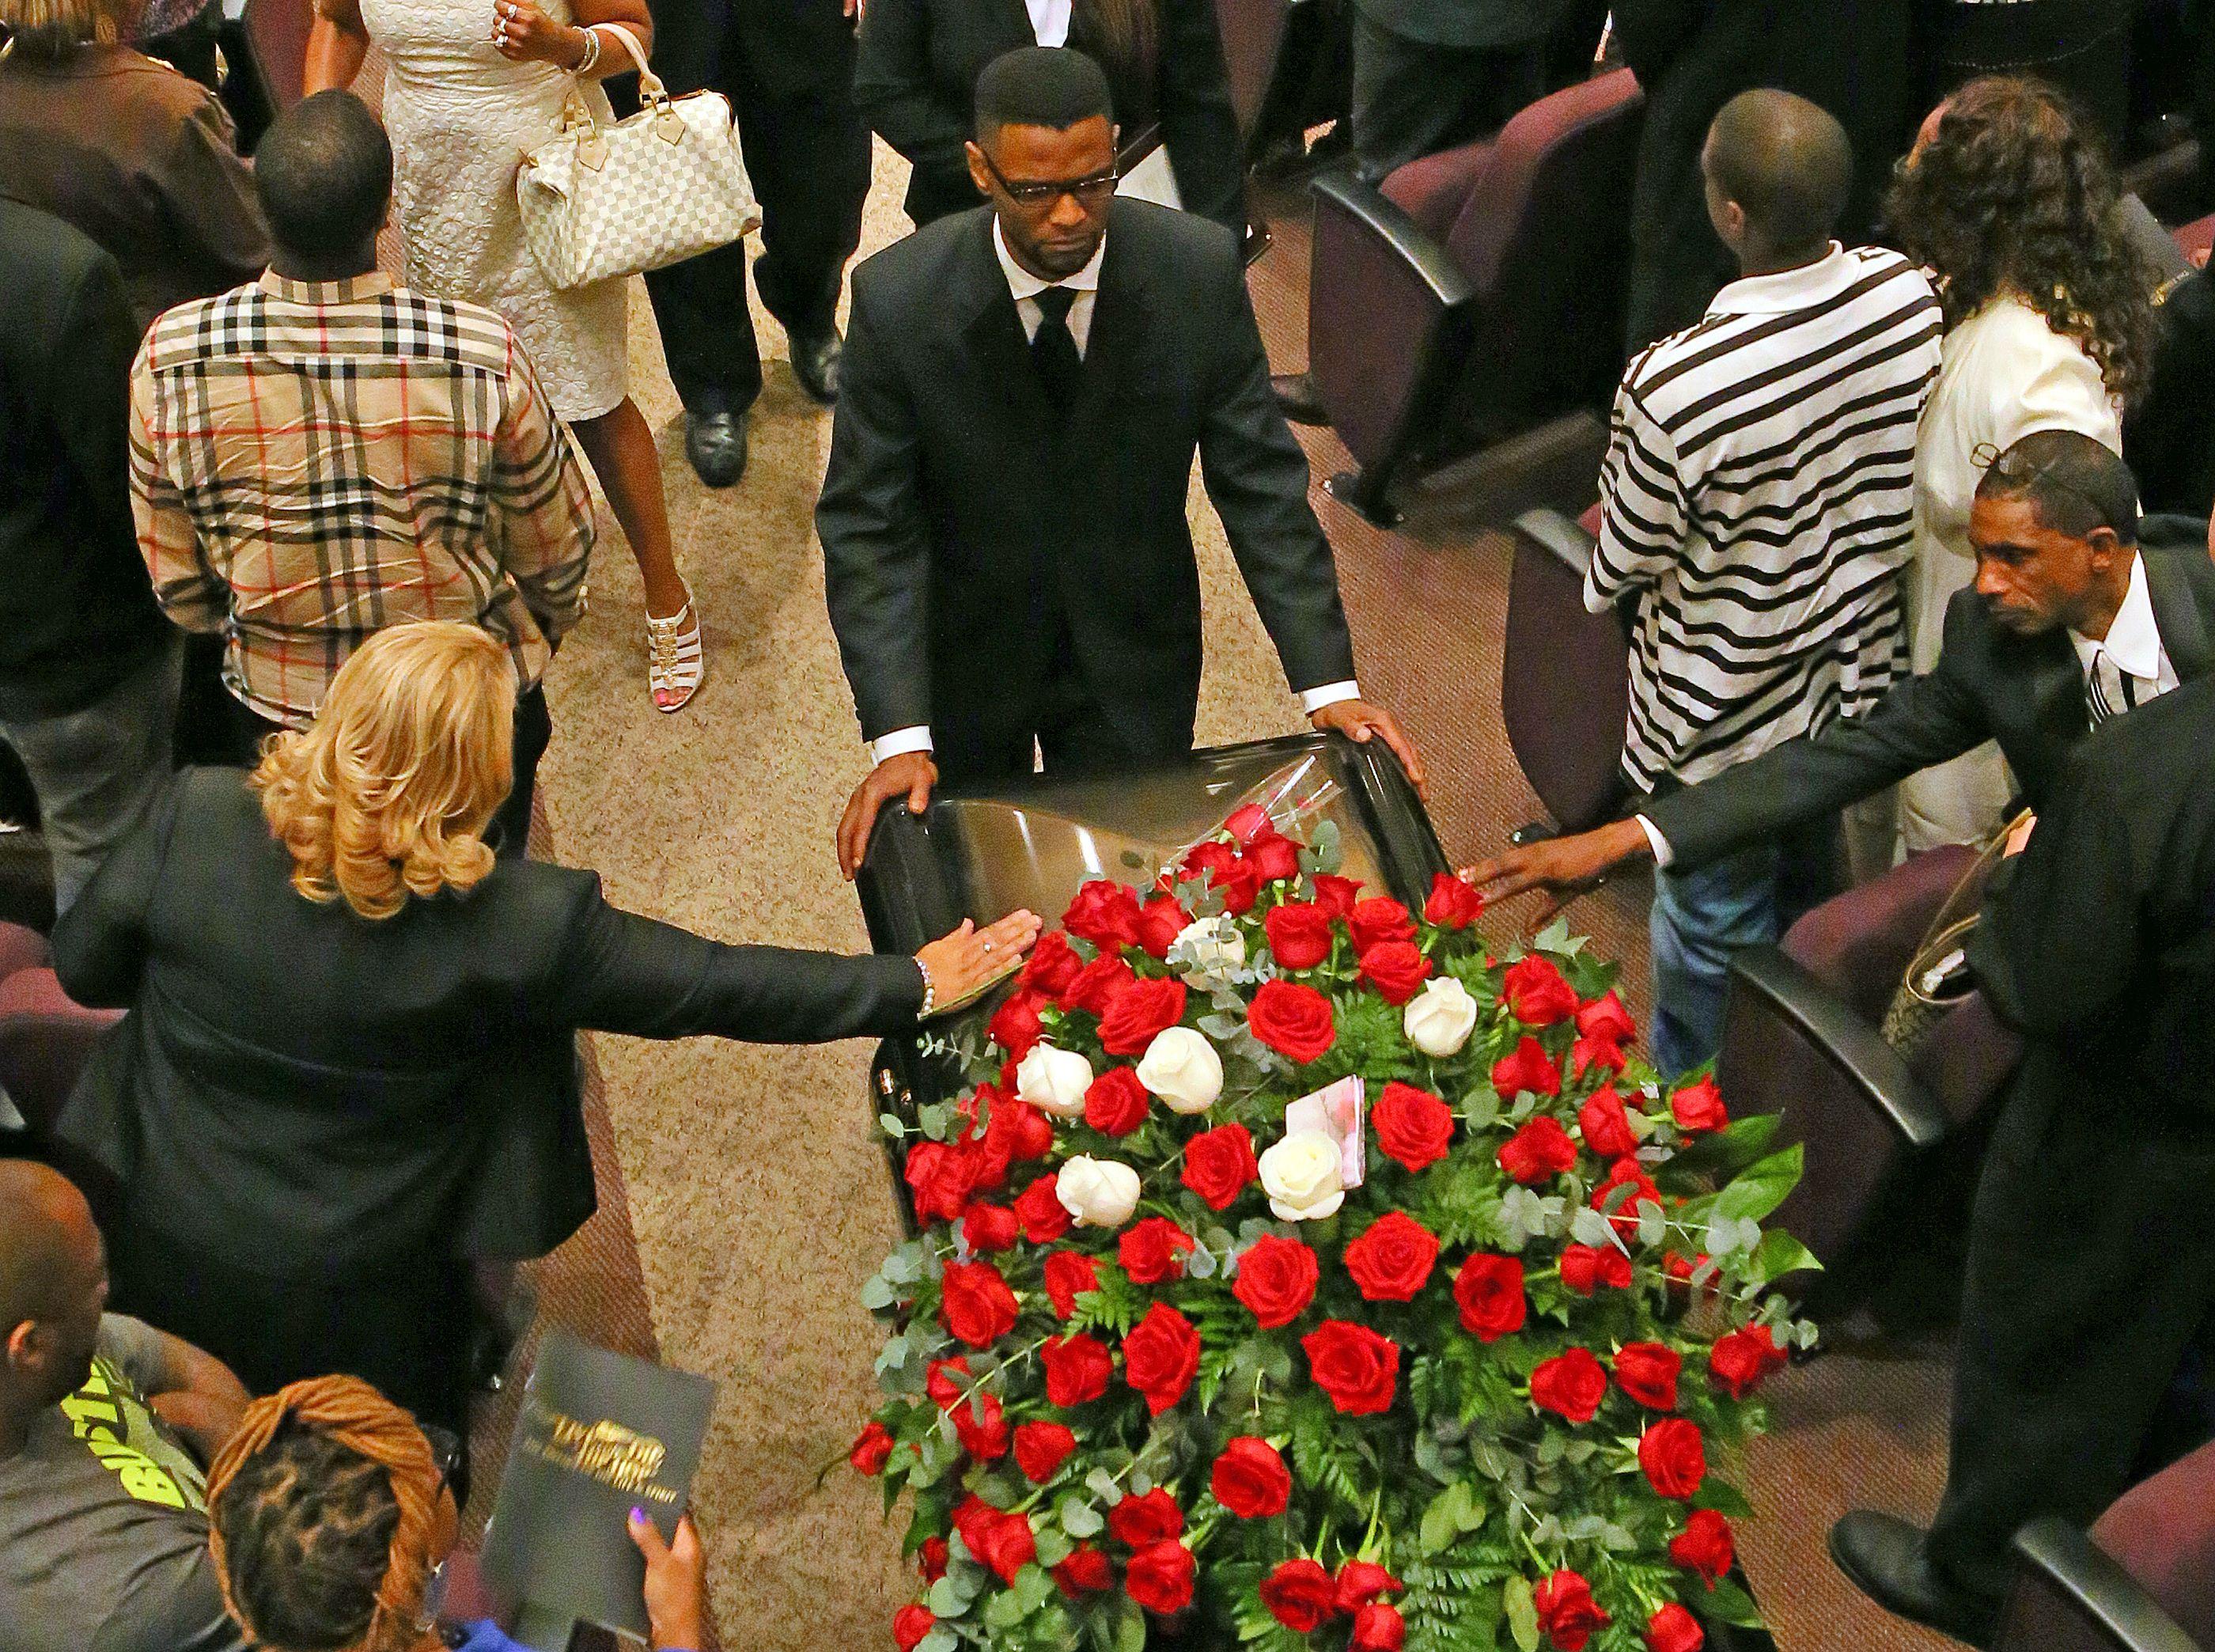 Christopher Kelly Funeral | Member of the Hip Hop group, Kris Kross | May 9, 2013 | Jackson Baptist Memorial Church, Atlanta, GA